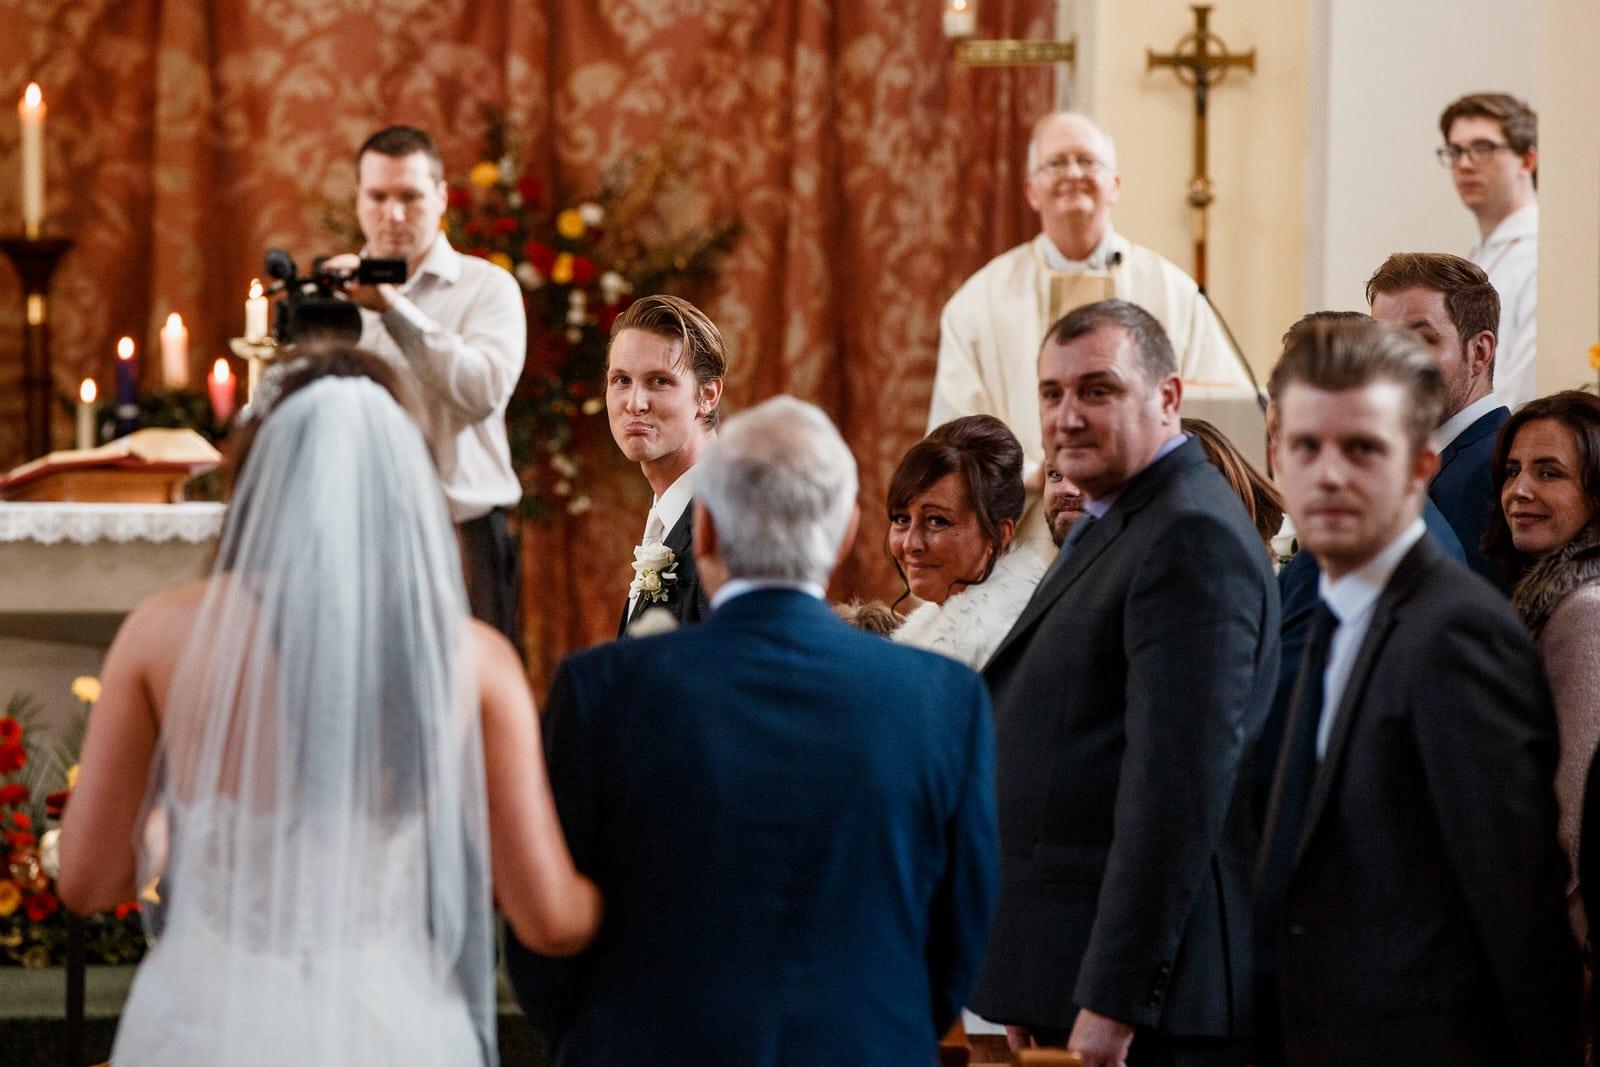 groom looking over shoulder down aisle at bride